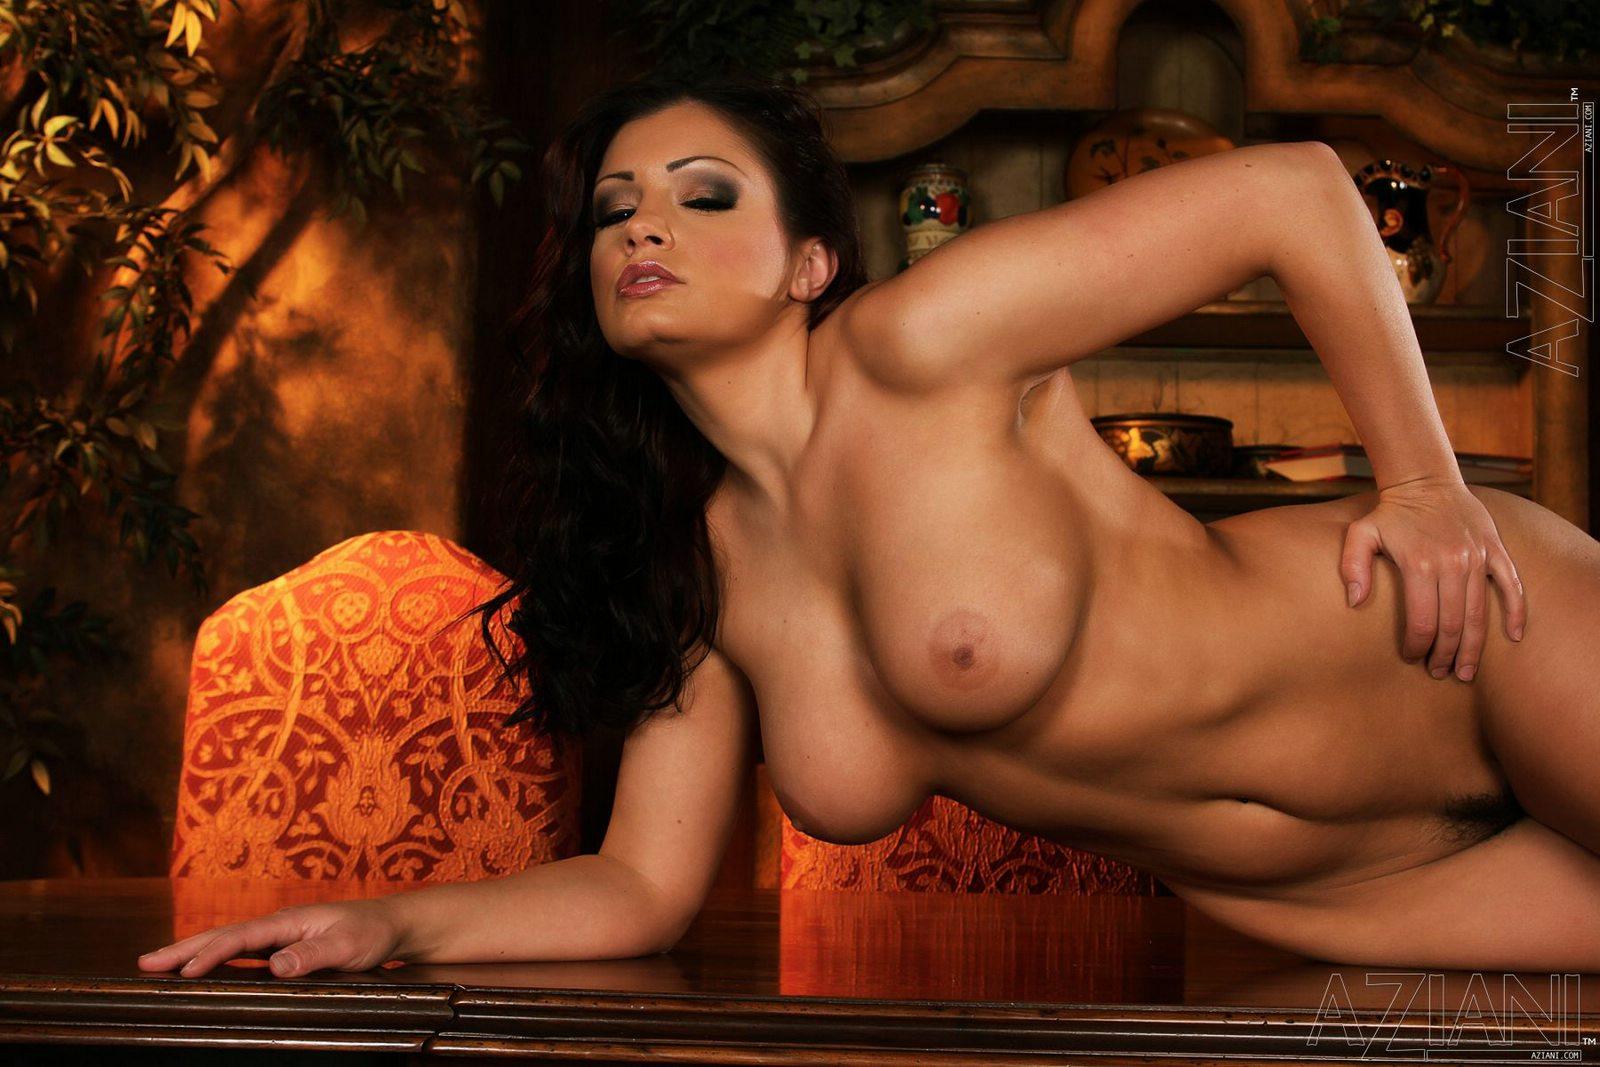 Photo aria giovanni naked female